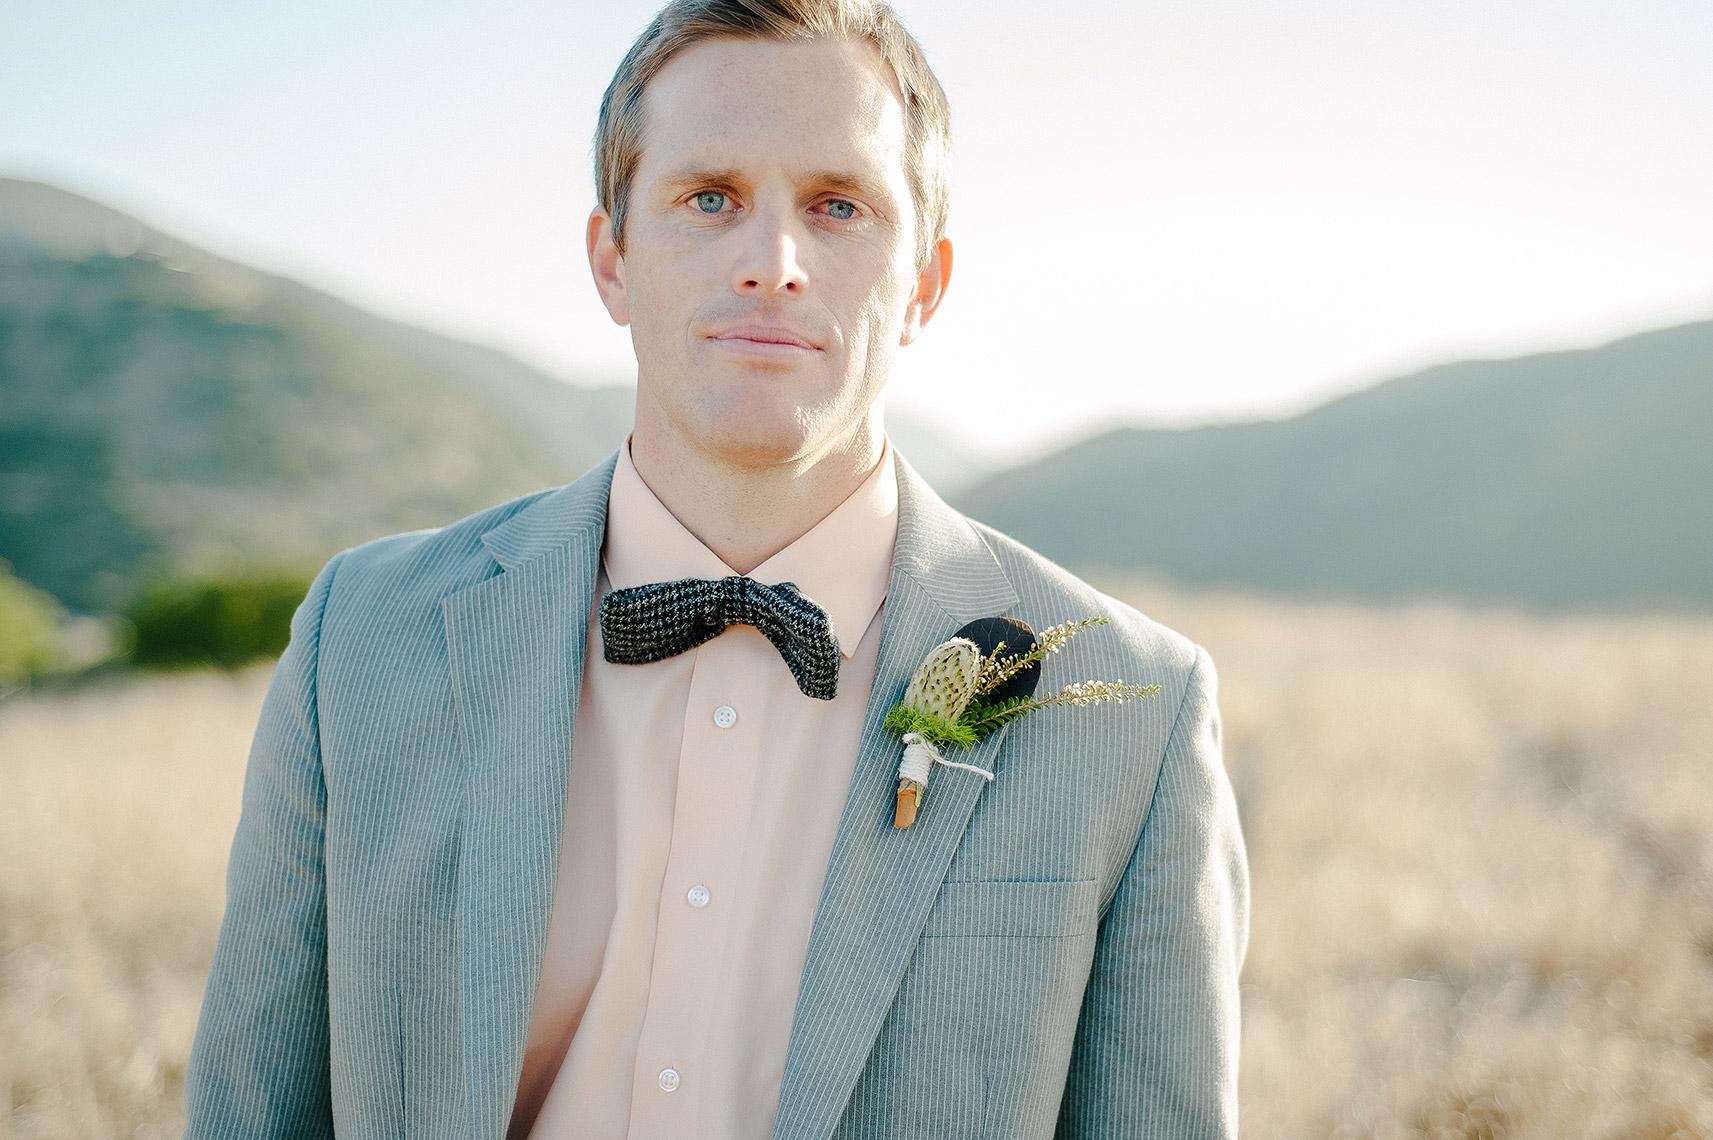 john-schnack-photography-san-diego-wedding-inspiration-shoot-back-country-vintage-wedding-32.jpg